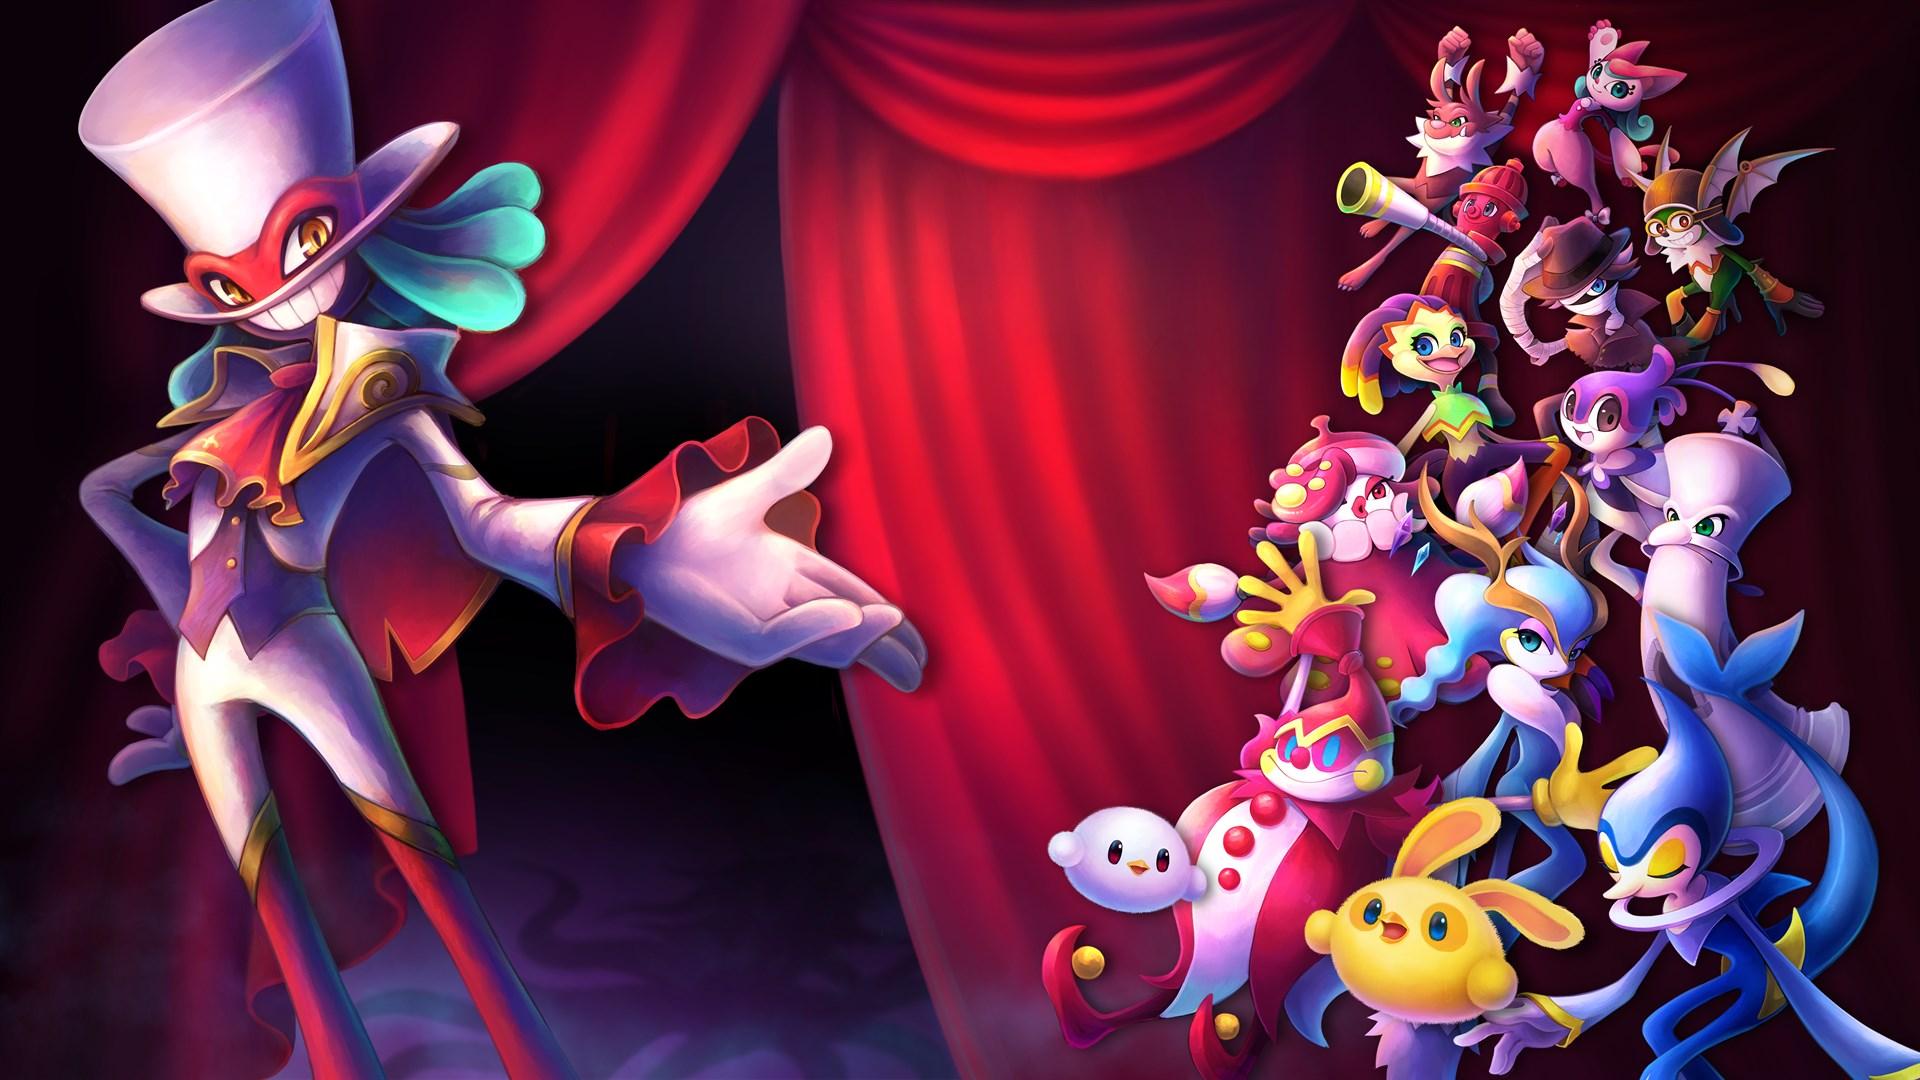 3D Platformer Balan Wonderworld Gets A March PS5 And PS4 Release Date